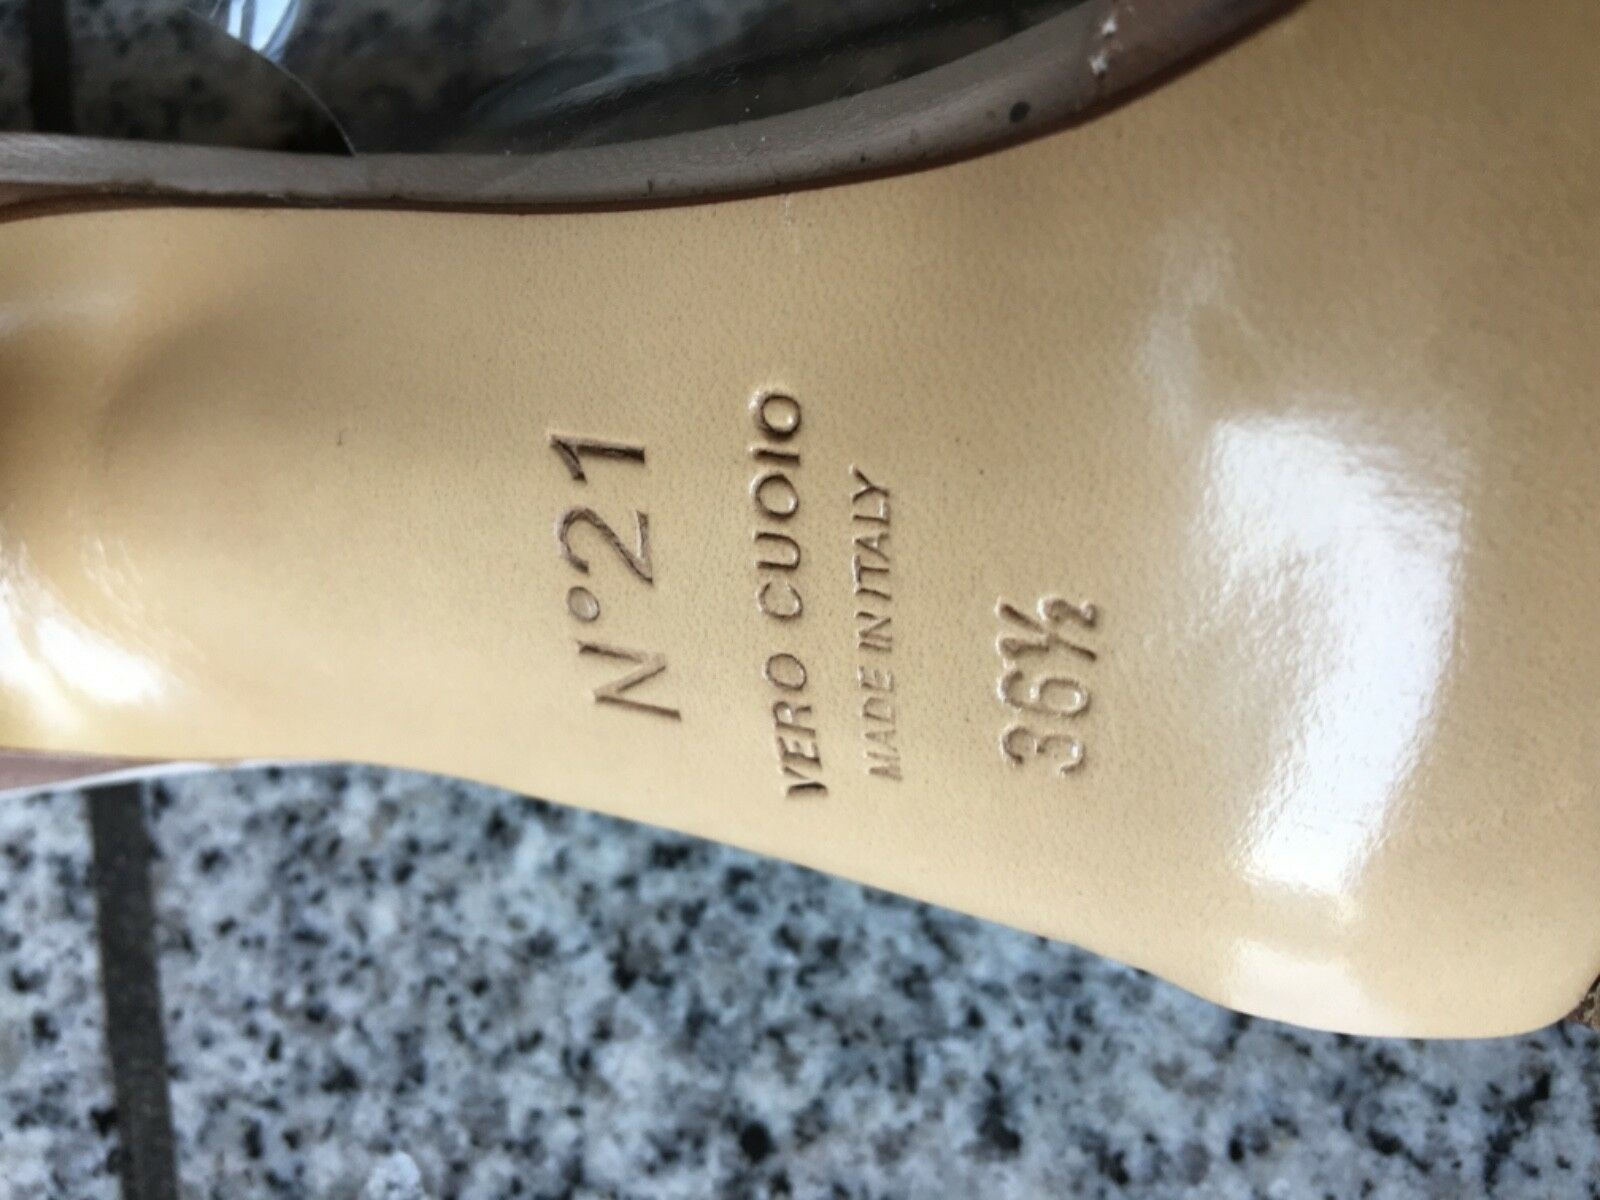 N°21 Gr. Alessandro Dell'Acqua Luxus Schuhe Gr. N°21 36,5 3040b5